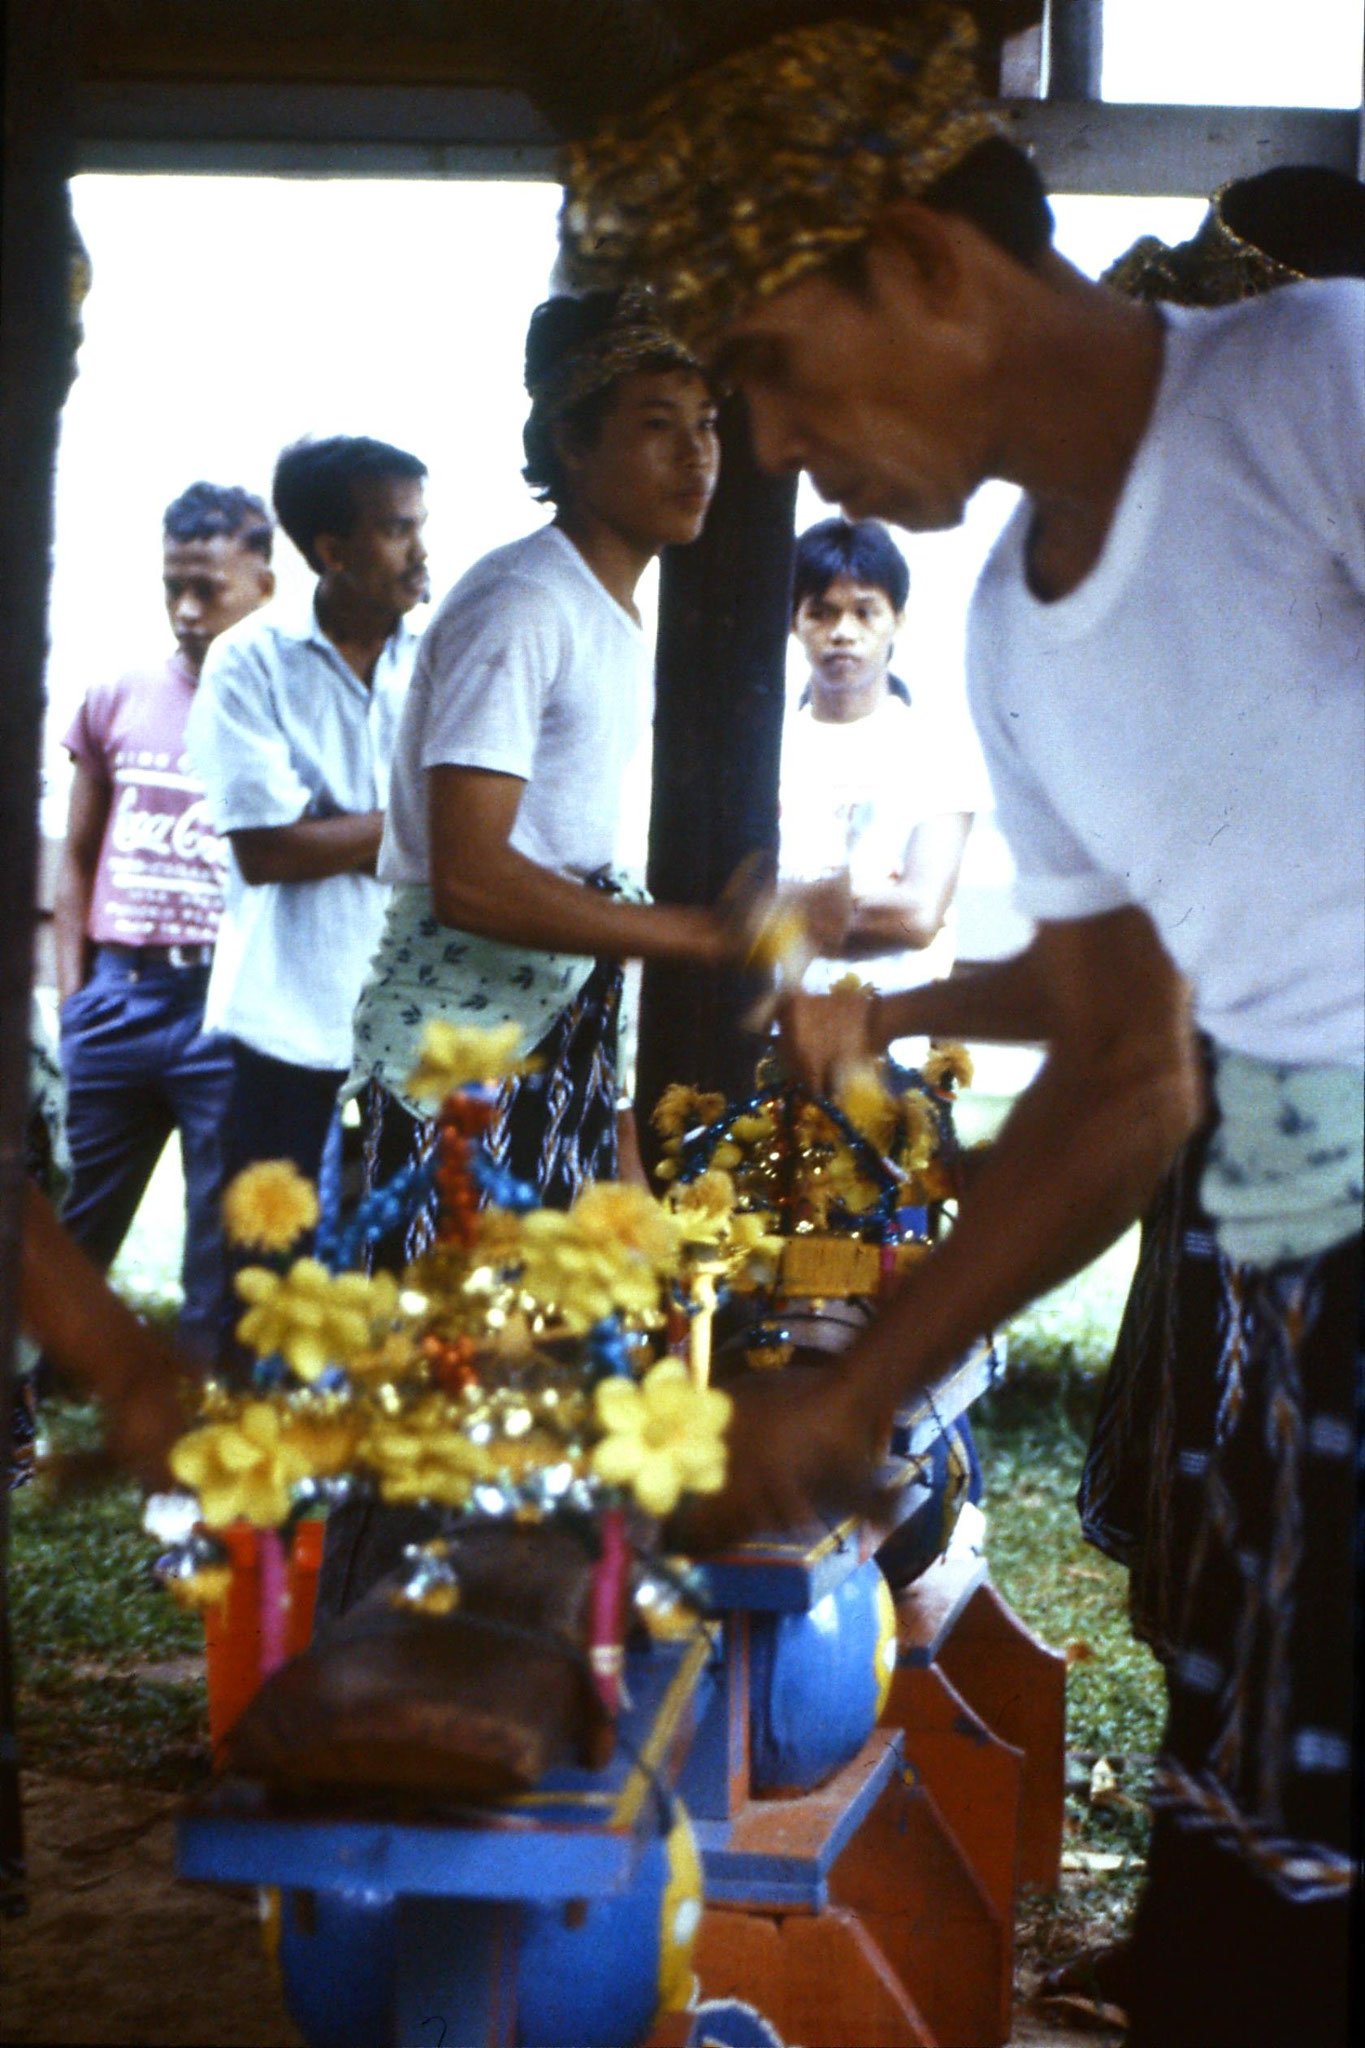 20/6/1990: 19: Kota Bharu cultural show